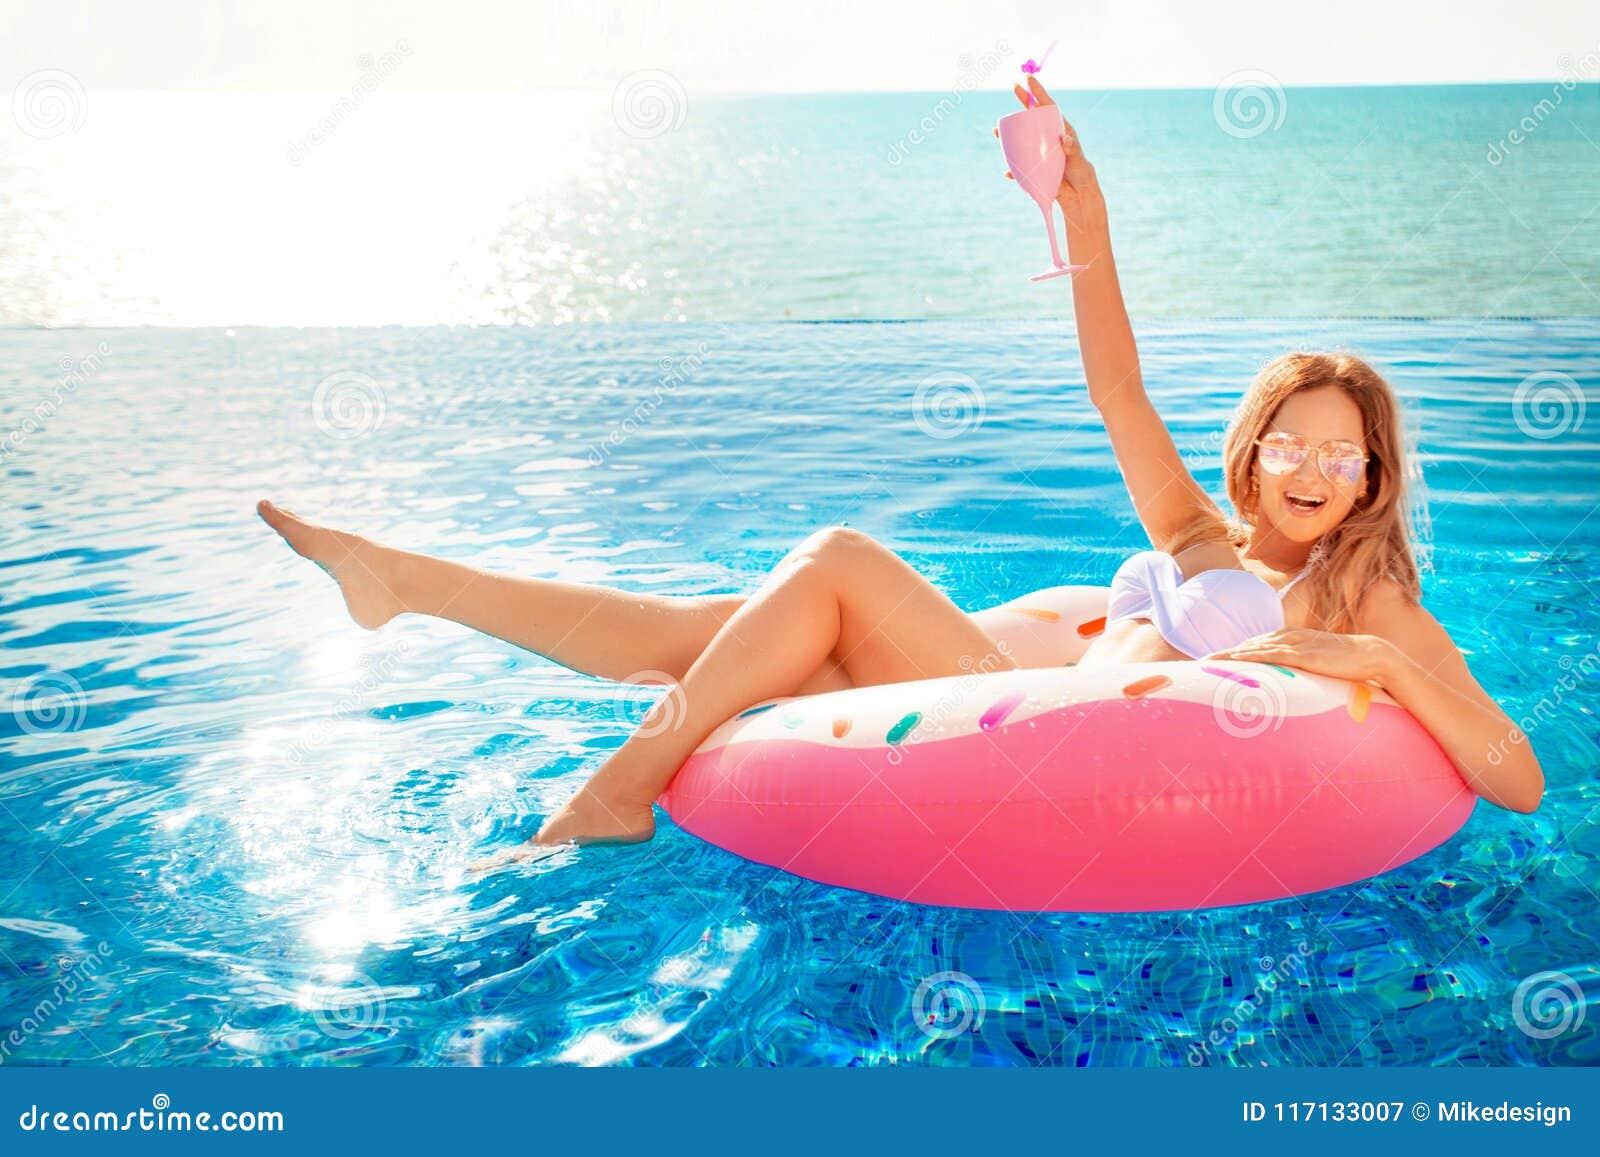 Katya krasnodar夏天领土假期 比基尼泳装的妇女在温泉游泳池的可膨胀的多福饼床垫 对海休息的旅行